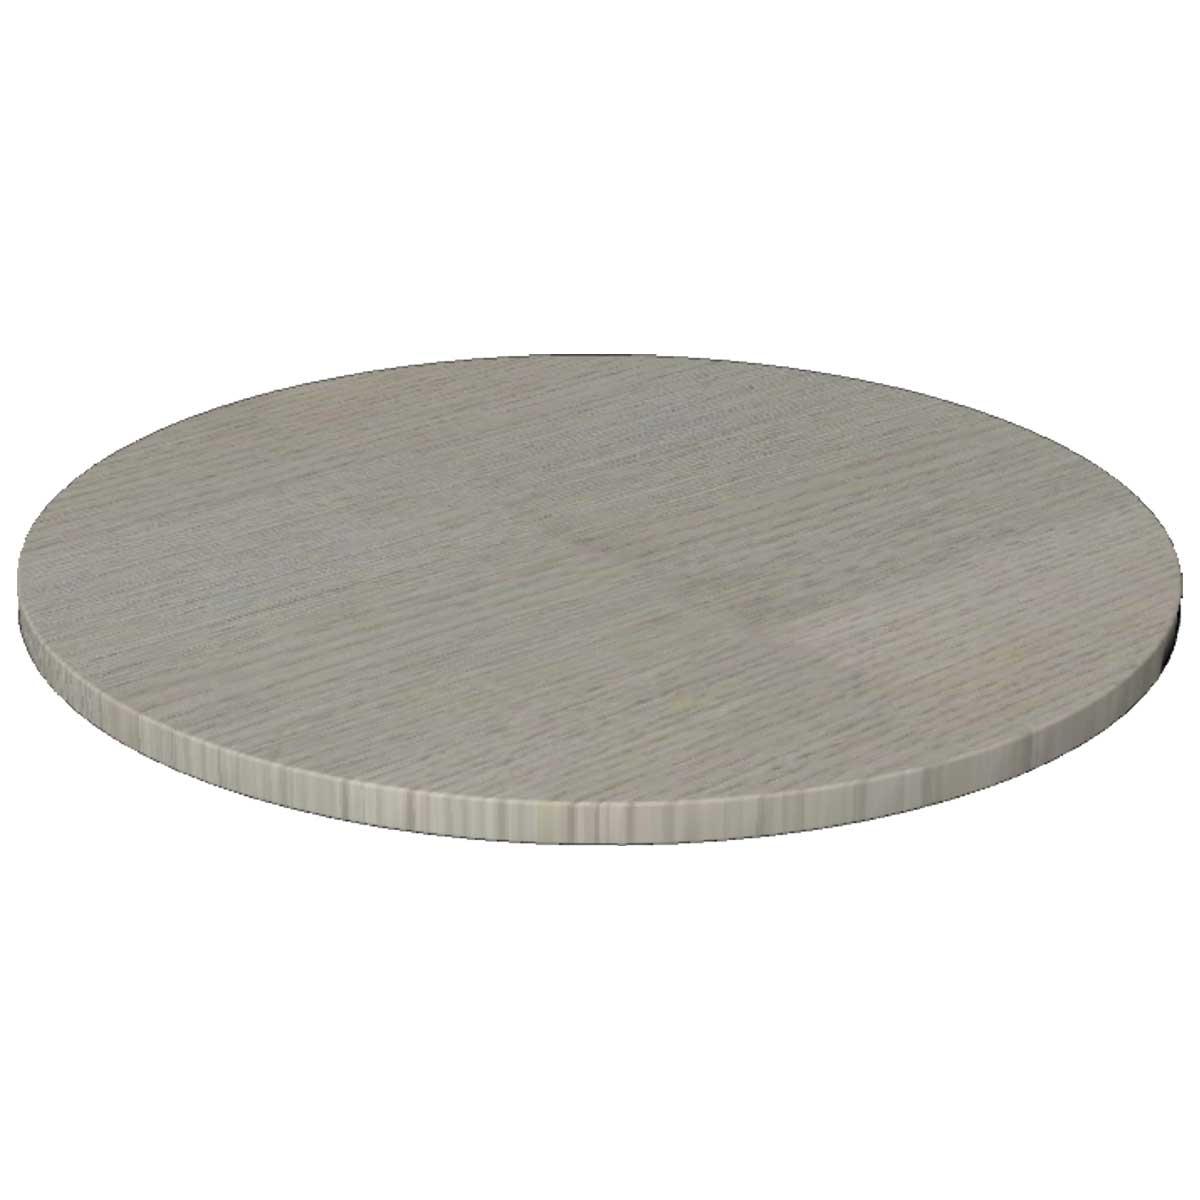 TICAM R60 4367 - https://www.werzalit.com/en/product/table-top-cambium-r-oe60cm-board-thickness-39cm-decor-courtrai/